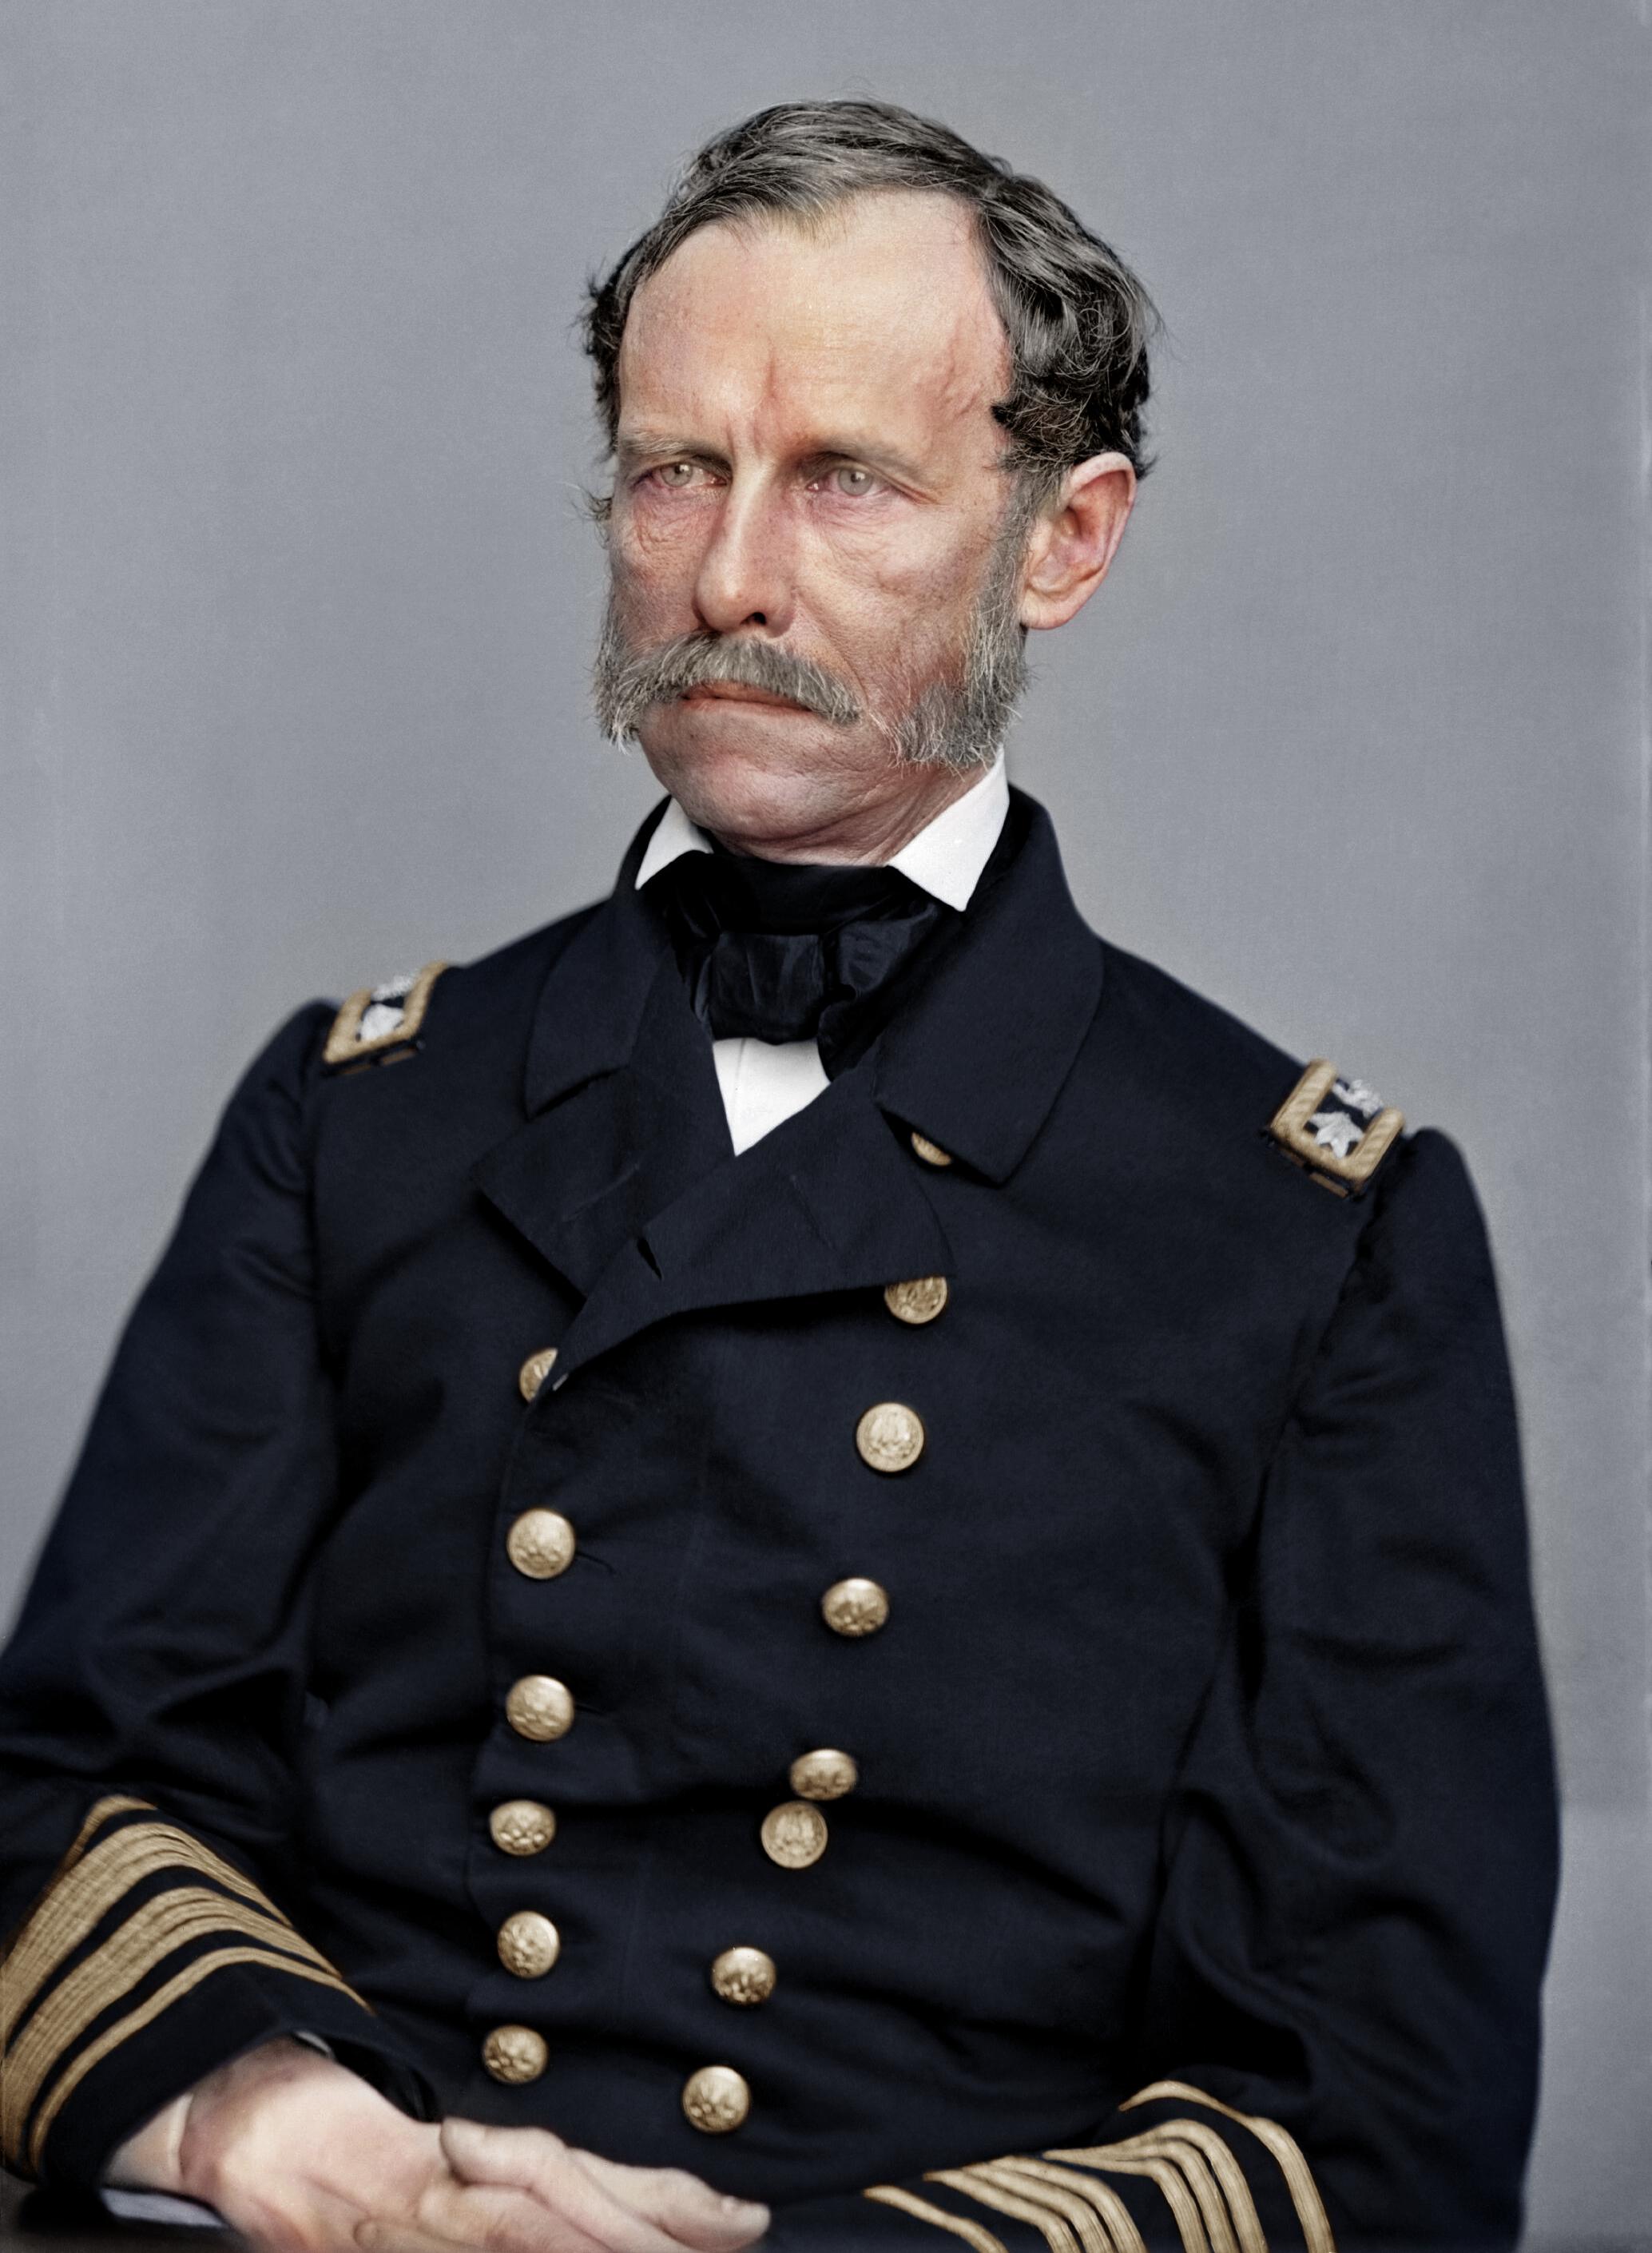 John A. Dahlgren. http://historyrestored.tumblr.com  - United States Navy officer who initiated major advances in gunnery, as founder of the U.S. Navy's Ordnance Department.